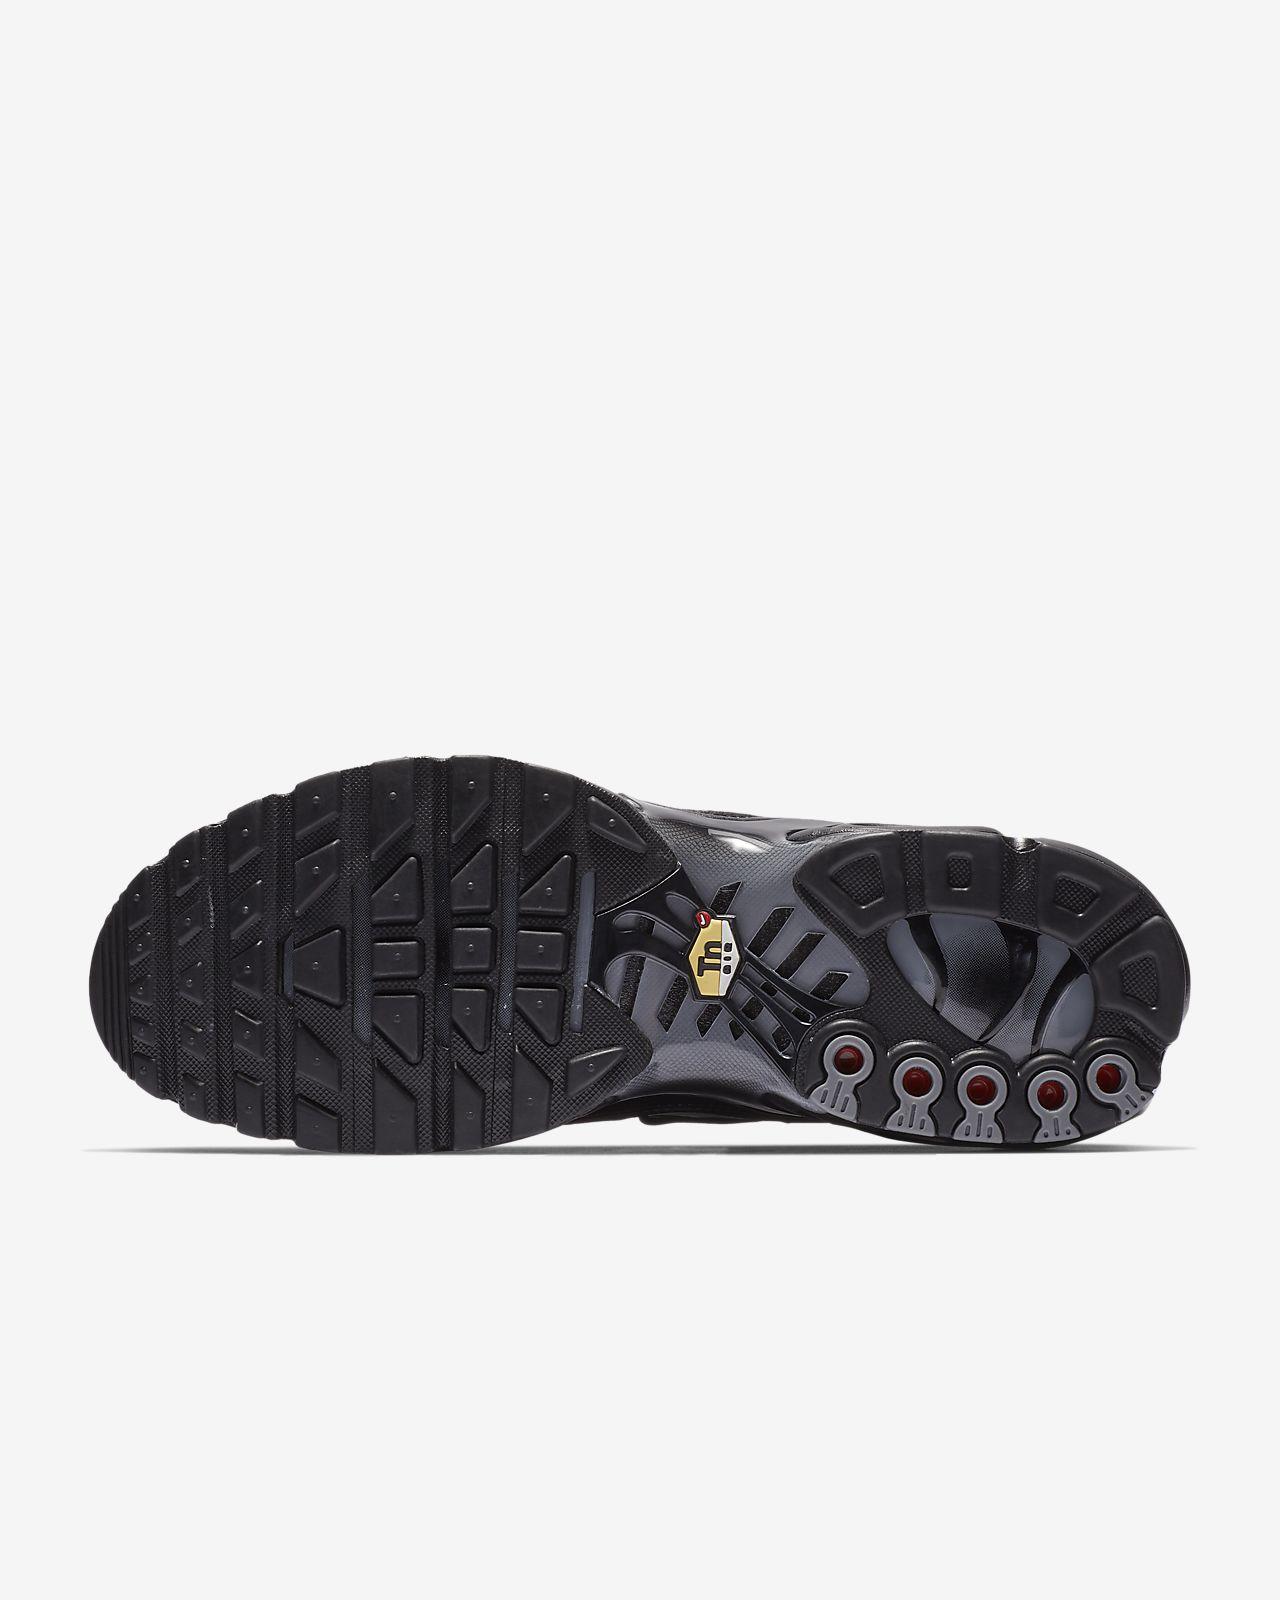 premium selection d9c95 fca8a ... Nike Air Max Plus Mens Shoe